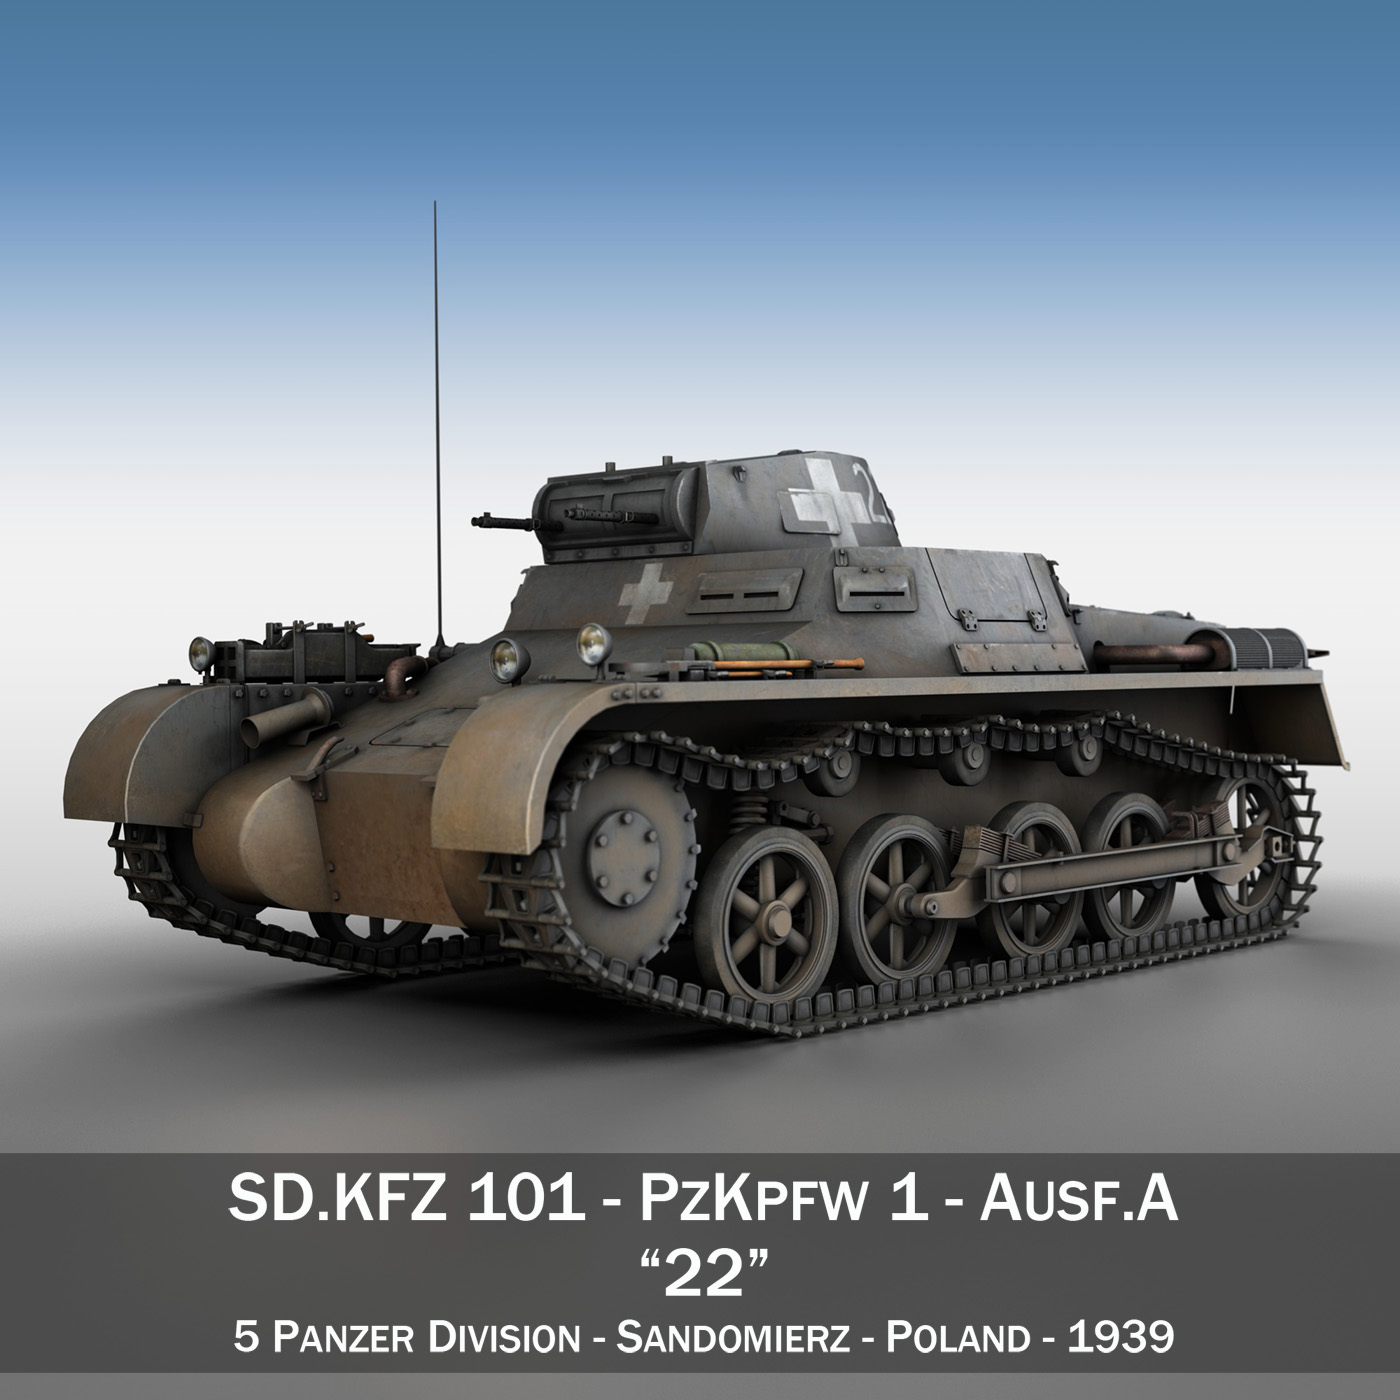 pzkpfw 1 - Panzer 1 - ausf. a - 22 3d modell 3ds fbx c4d lwo obj 186926